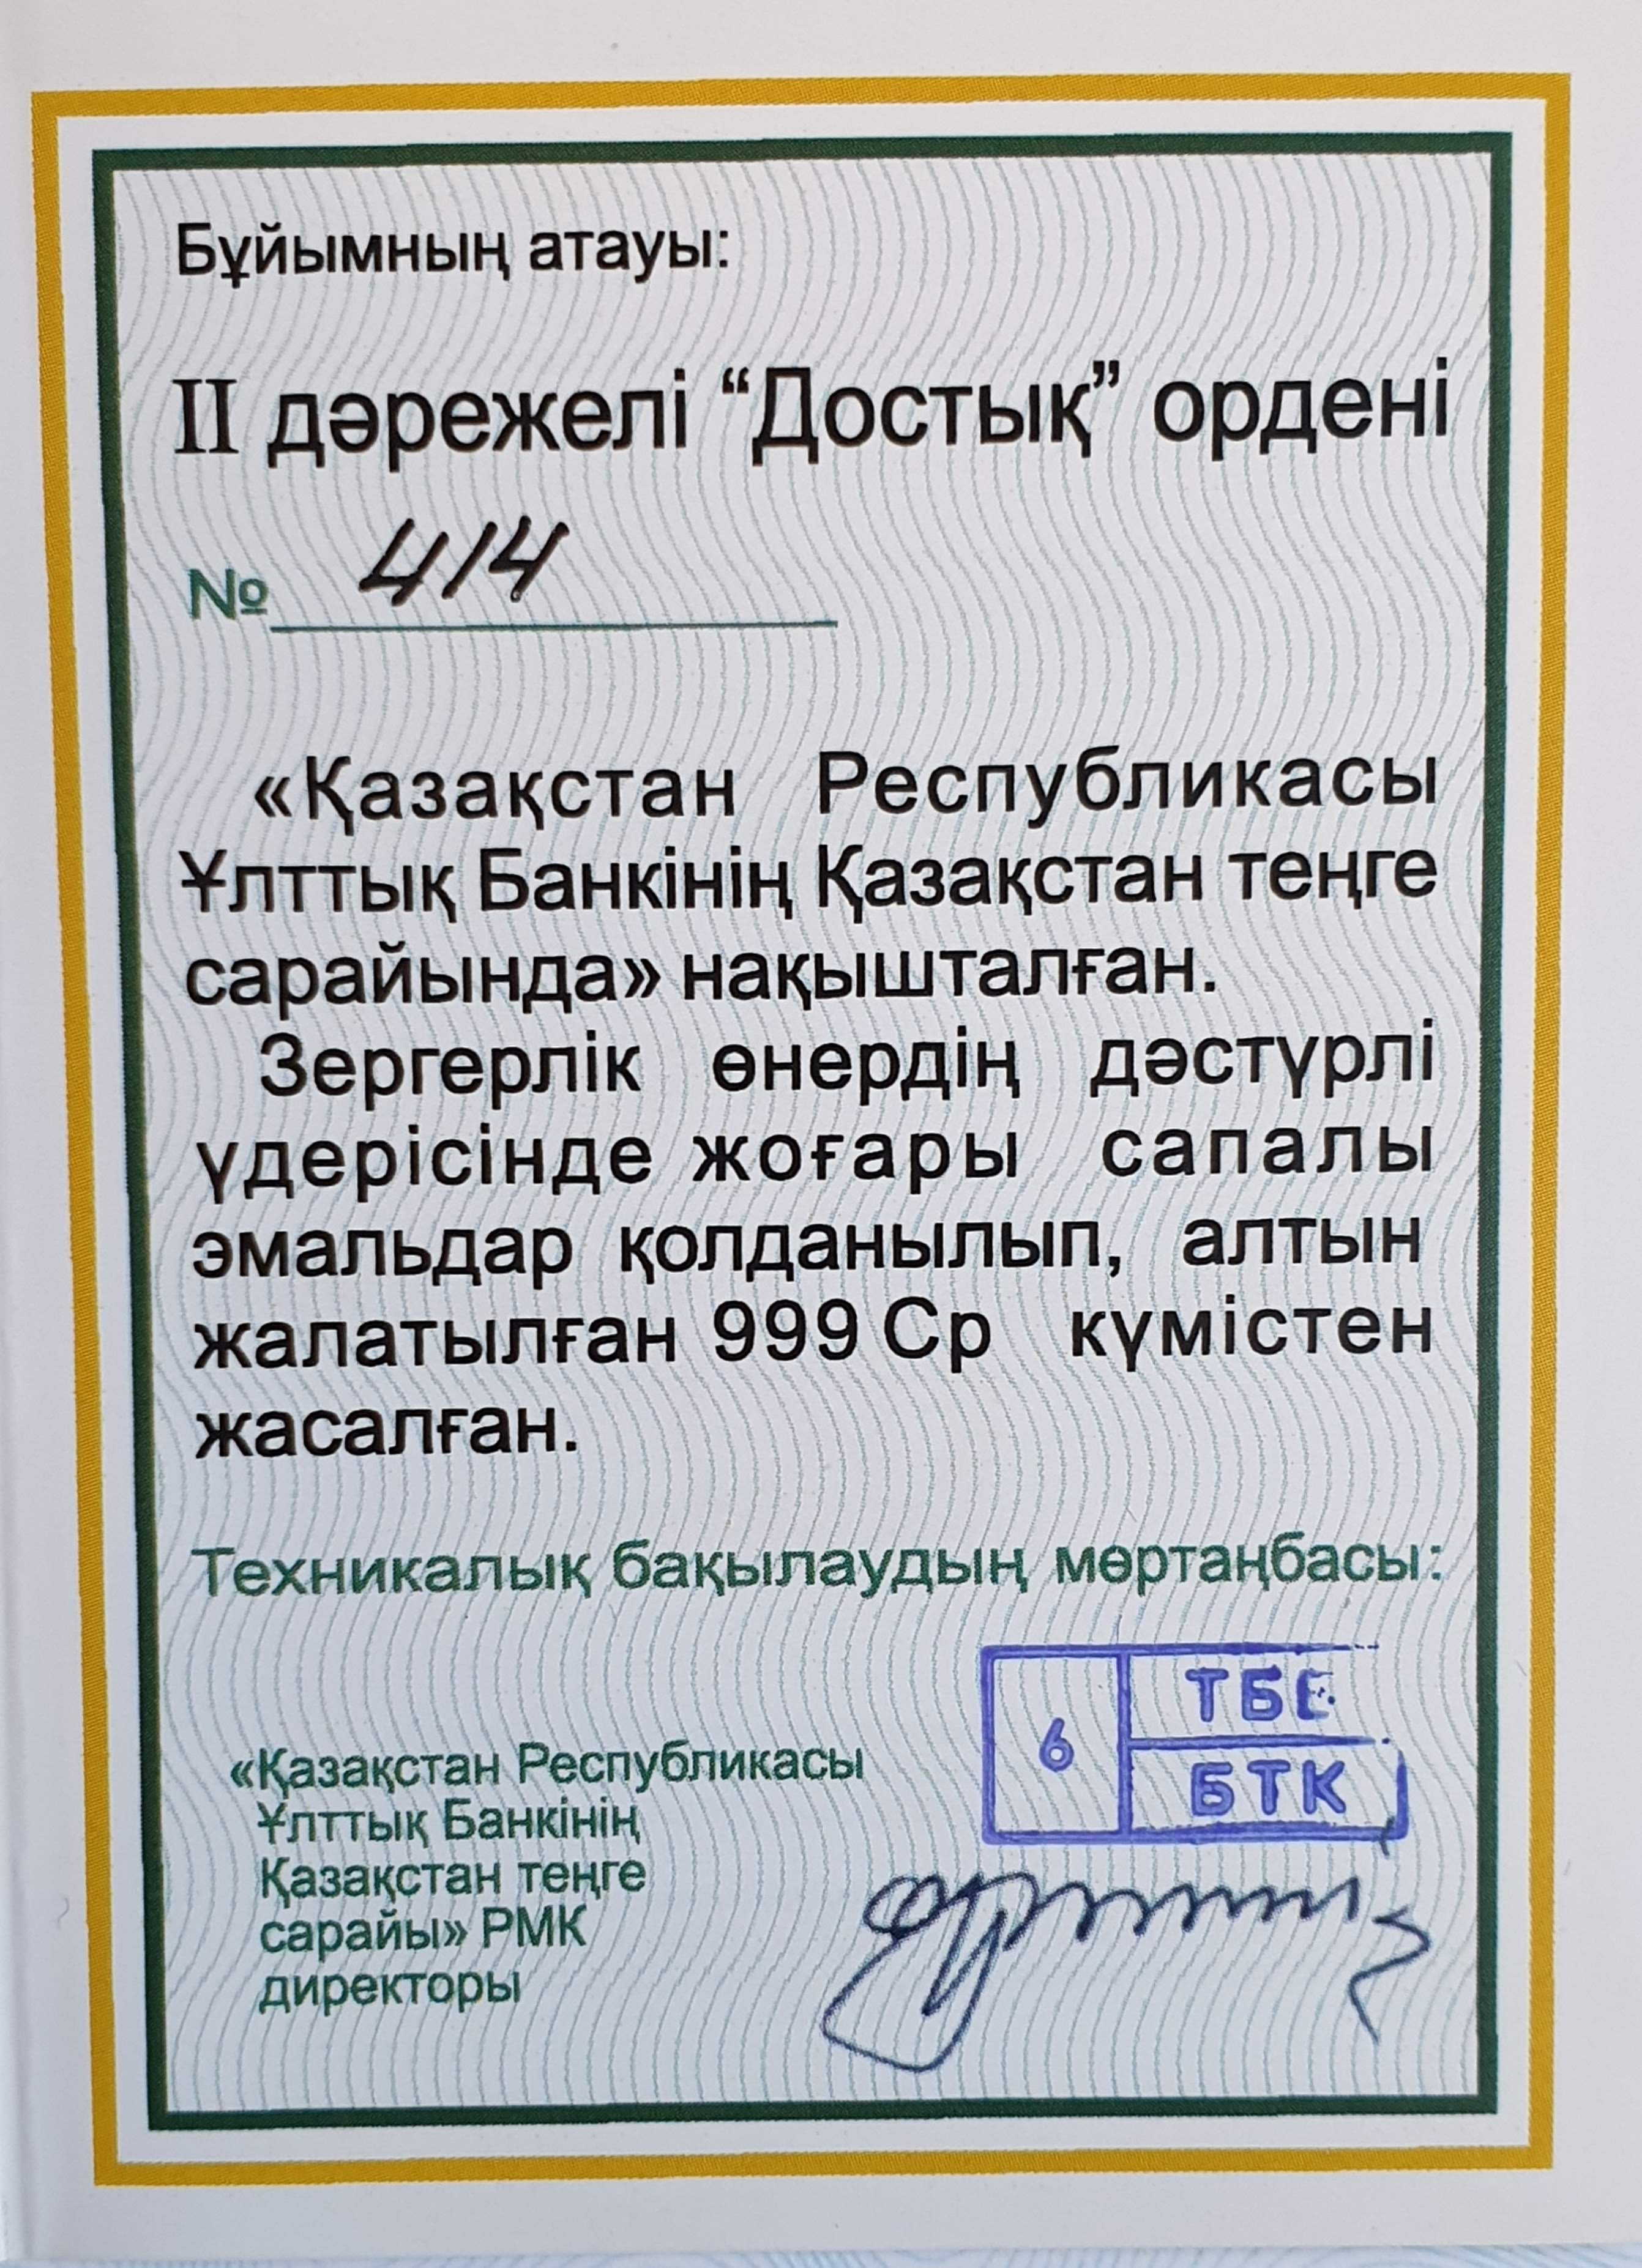 20190218_163701-01